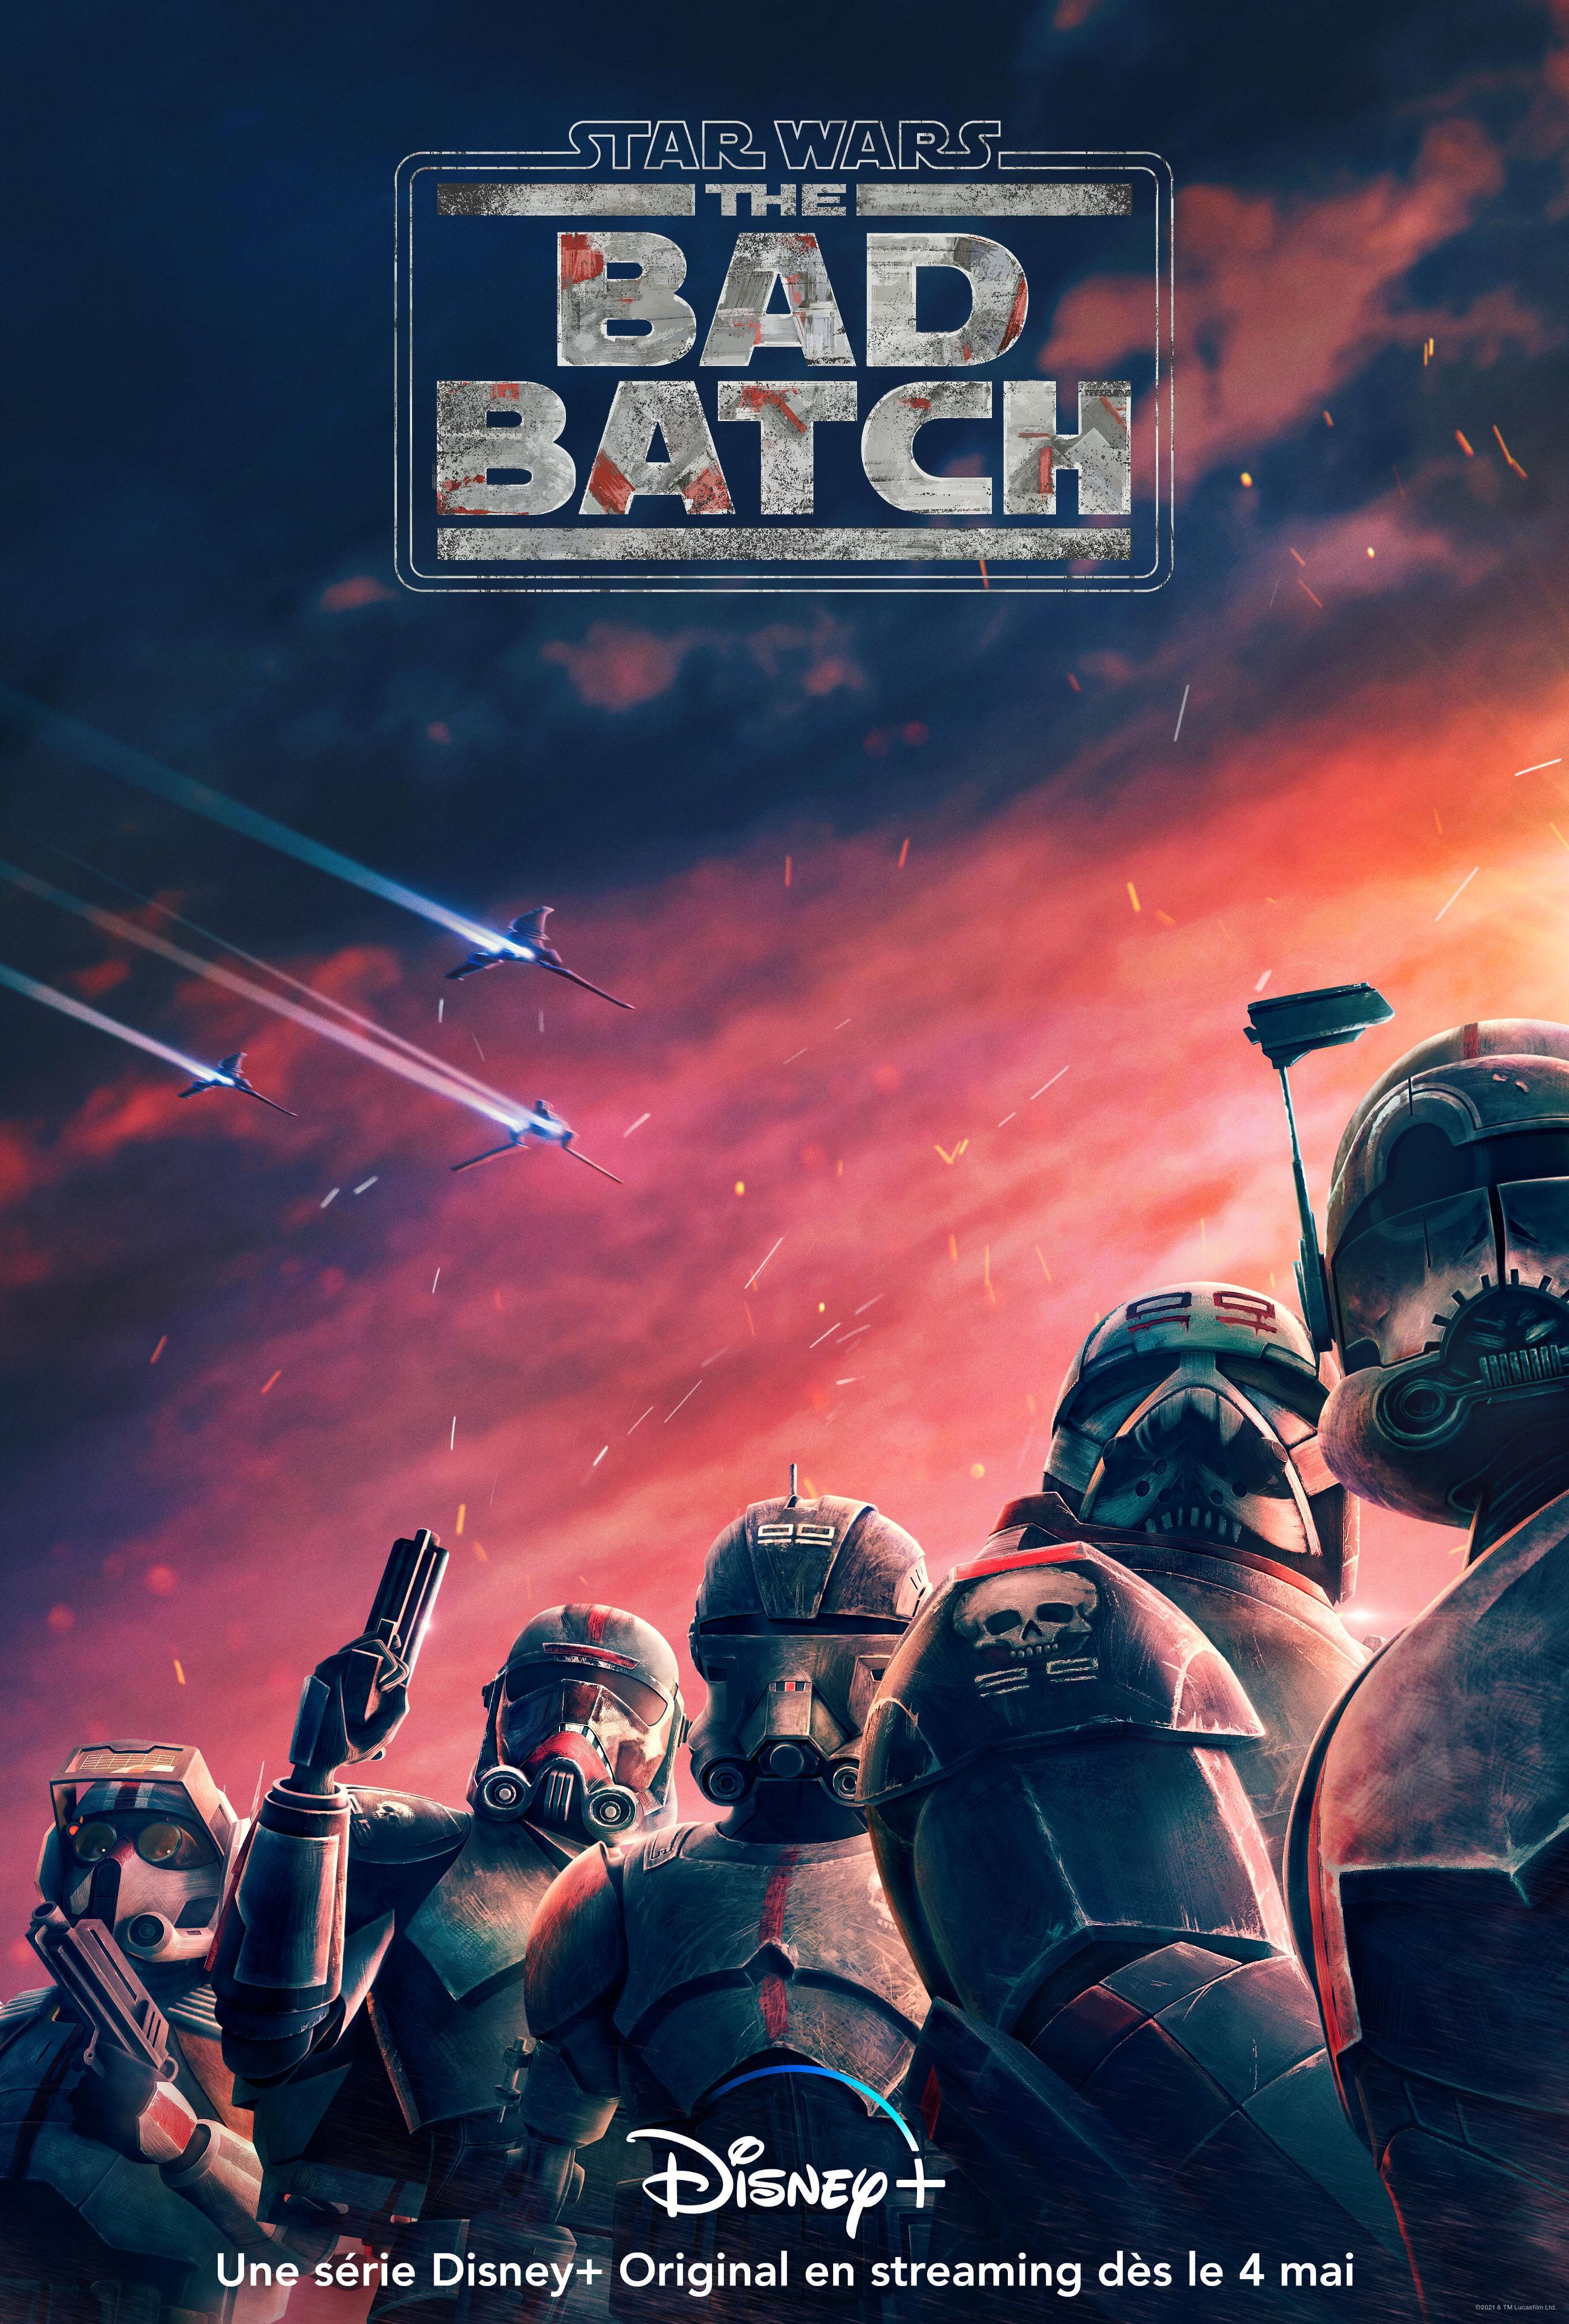 Star Wars : The Bad Batch [Lucasfilm - 2021] Exu5r3uW8AMW5Os?format=jpg&name=4096x4096